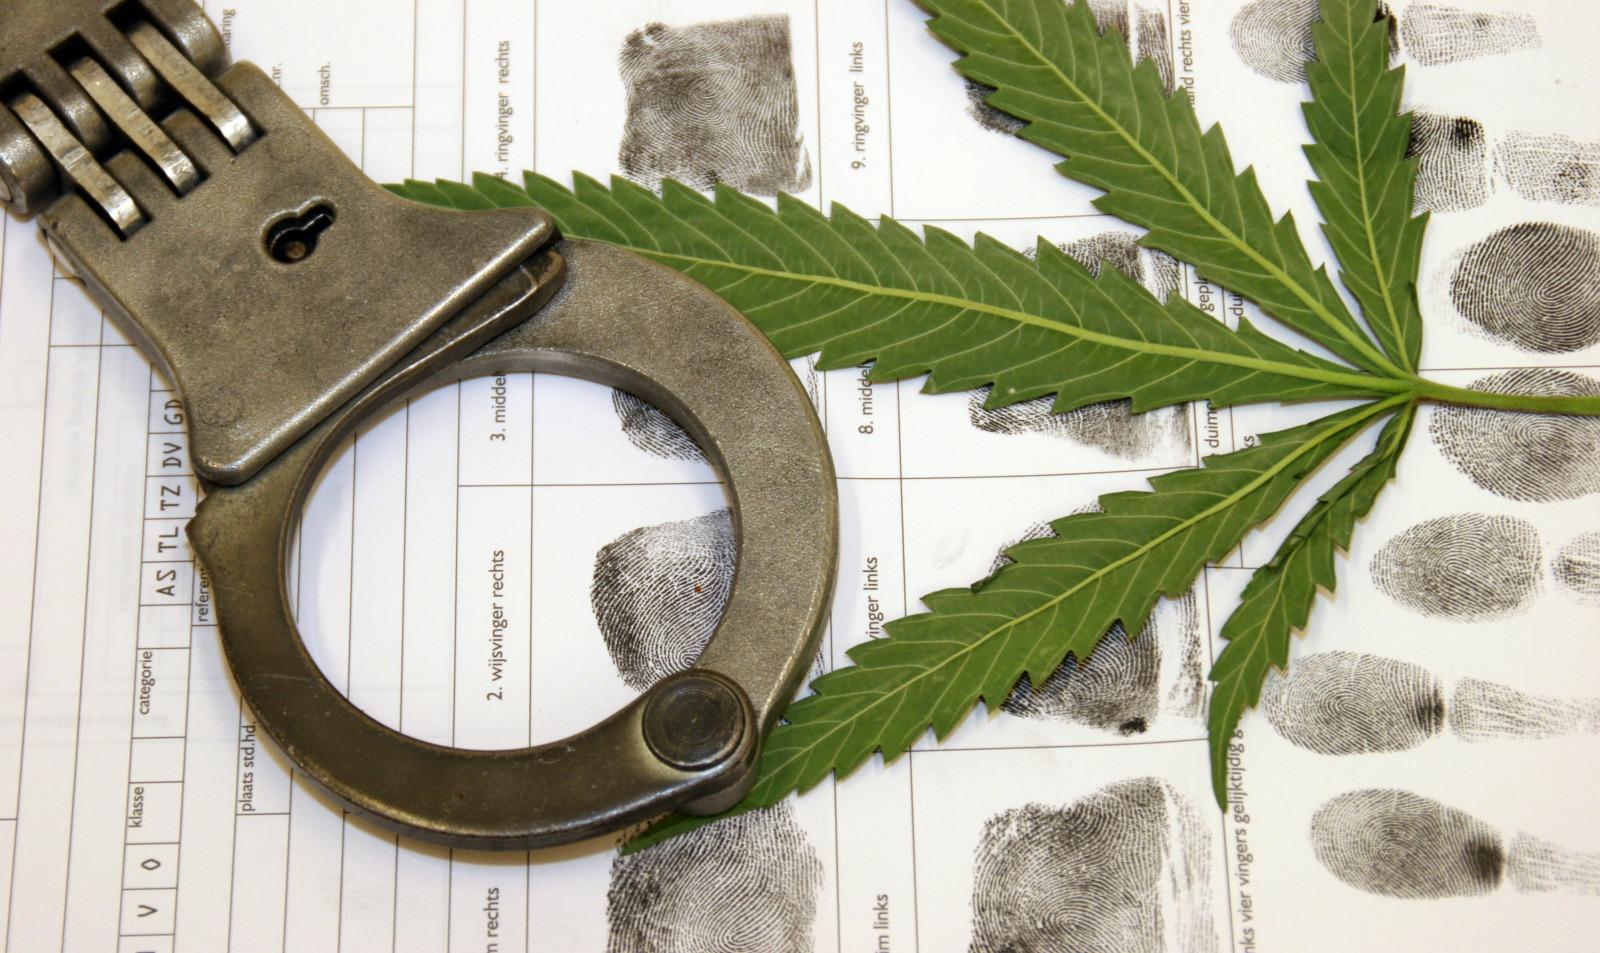 Areszt za marihuanę